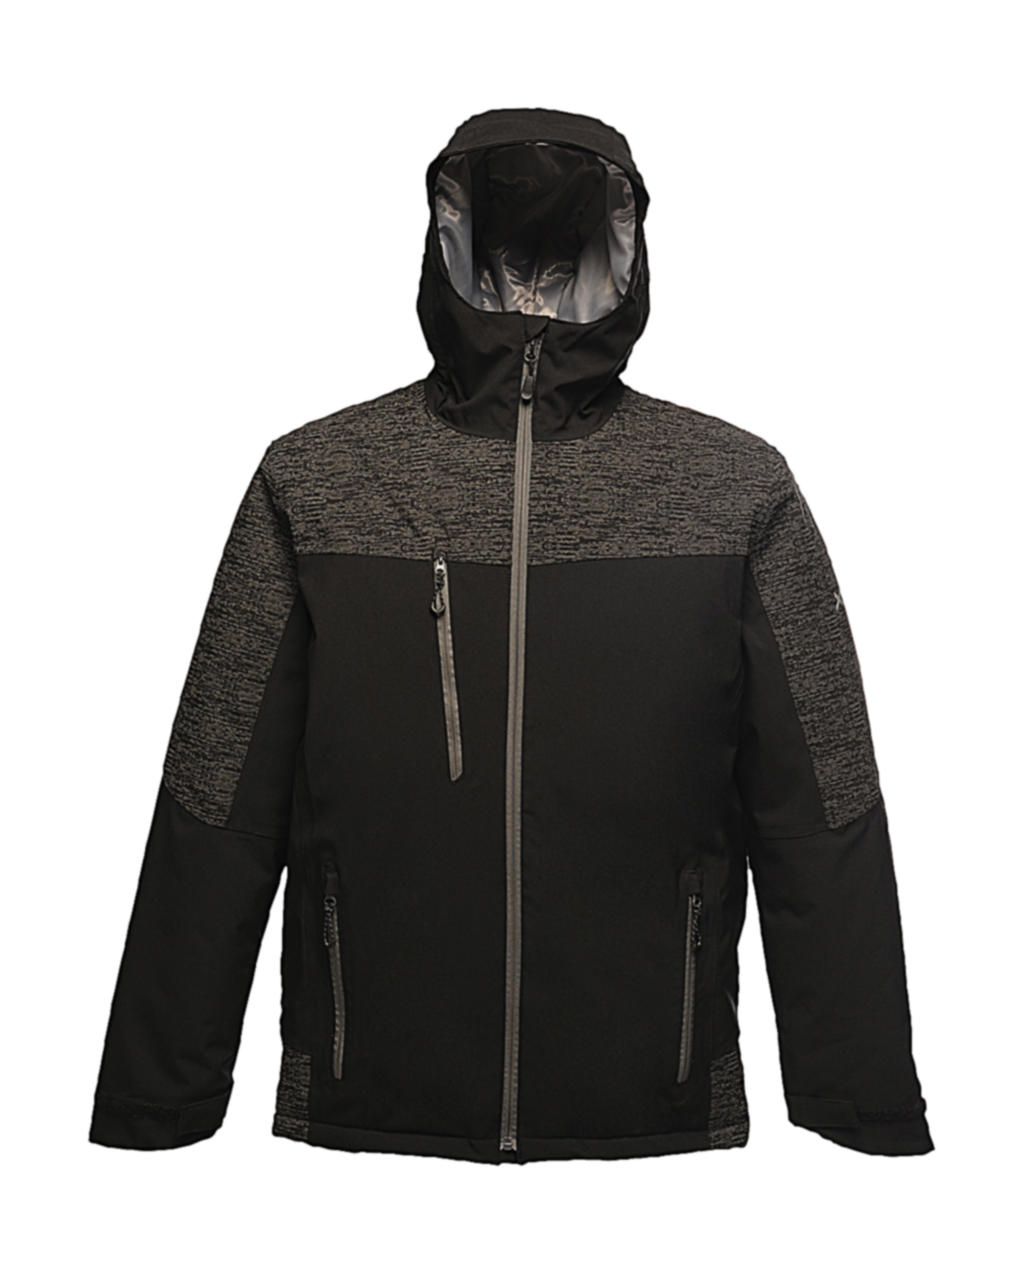 X-Pro Marauder II Insulated Jacket